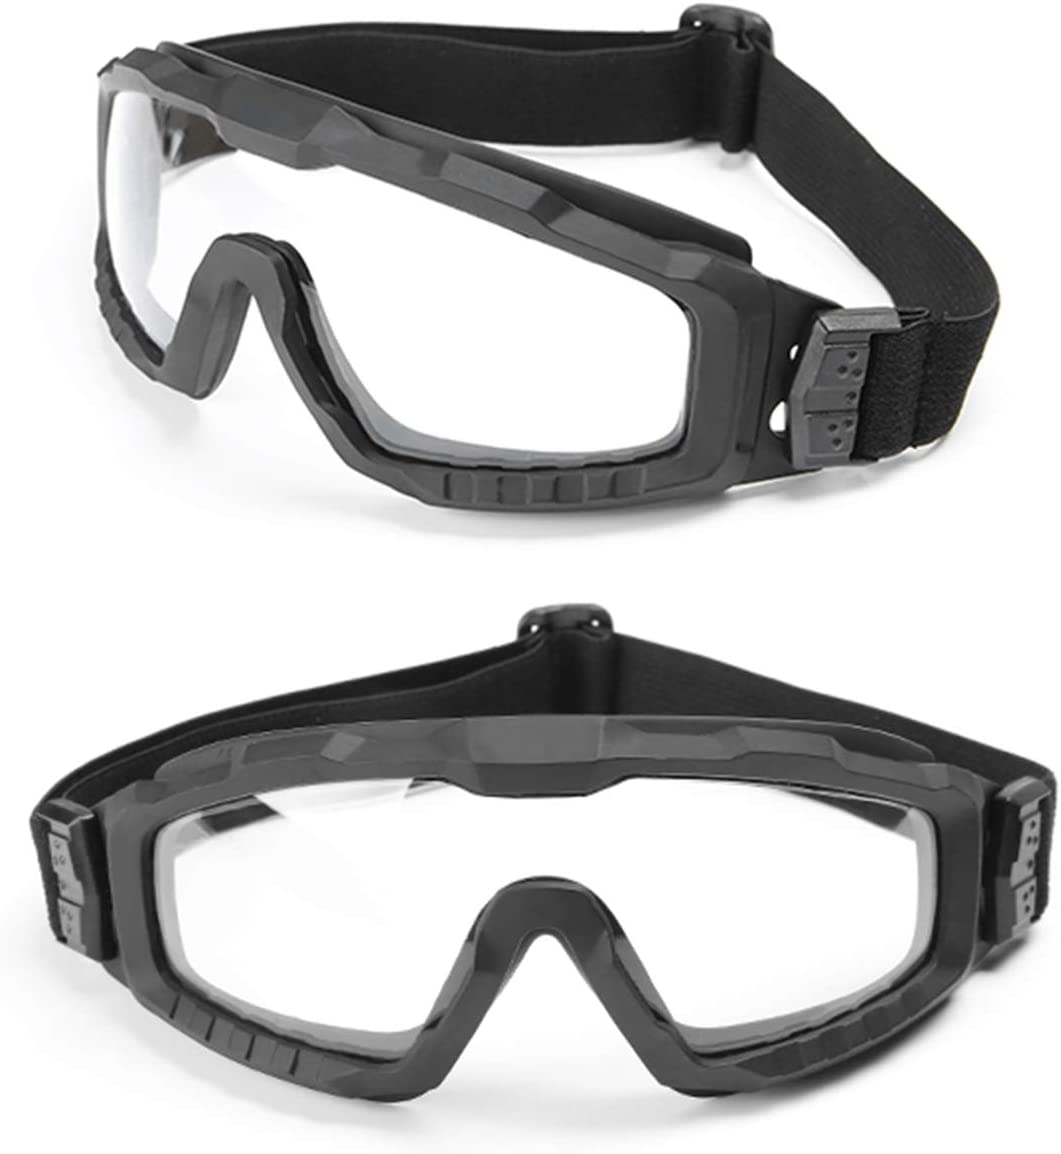 YH Occhiali di Protezione Antinfortunistica Occhiali Occhiali Antipolvere Trasparenti Occhiali da Lavoro Lab Occhiali protettivi Occhiali antispruzzo per Occhiali